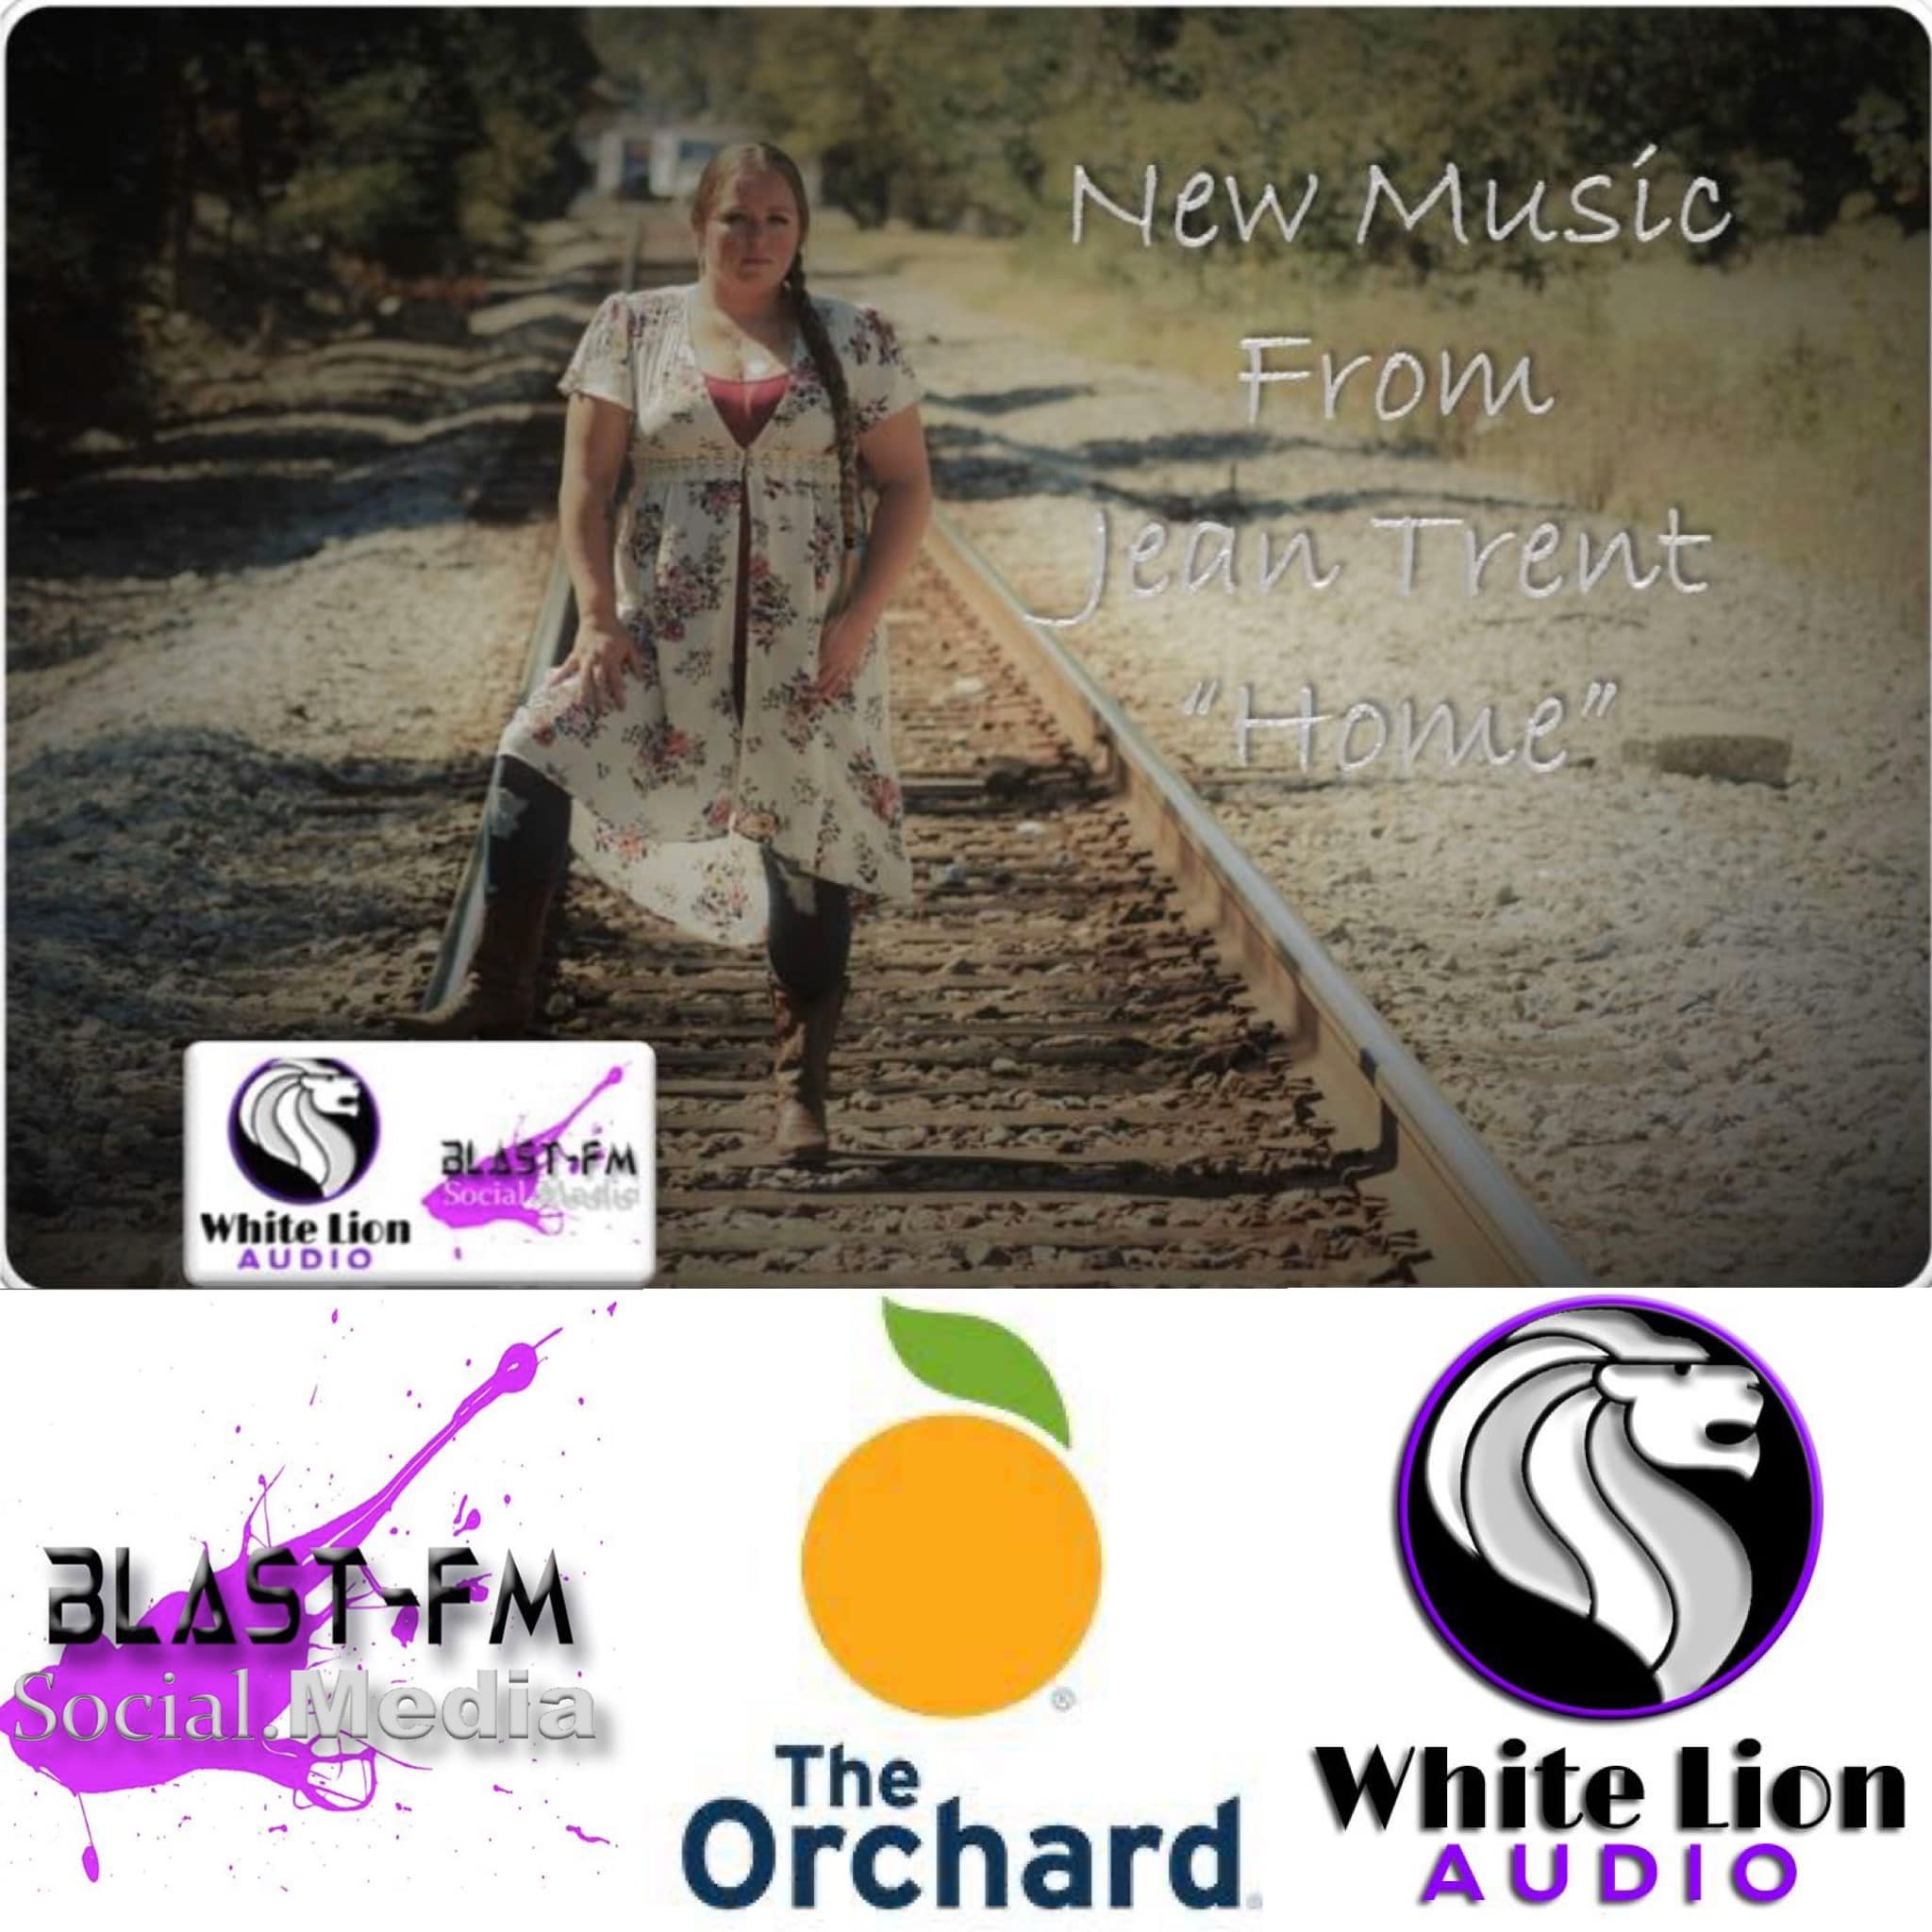 Jean Trent - Dear JMedia/BlastFM,  I just wanted to take... | Facebook